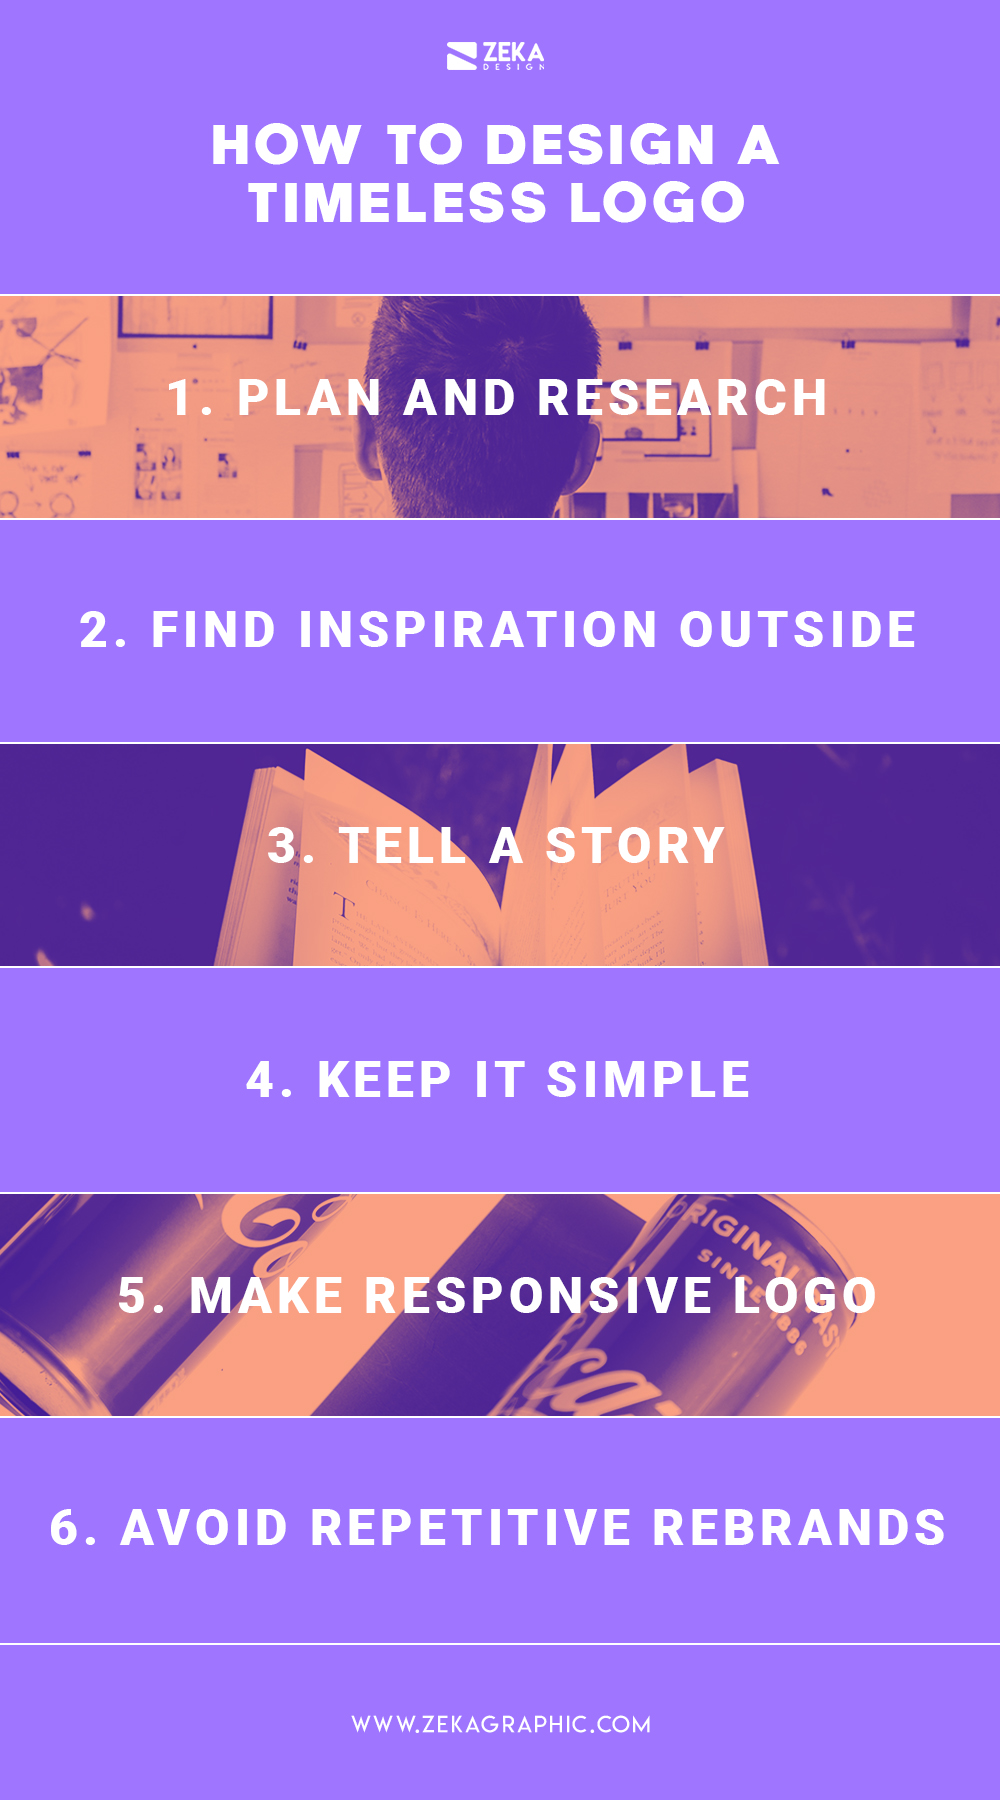 How To Make a Timeles Logo Design Infographic